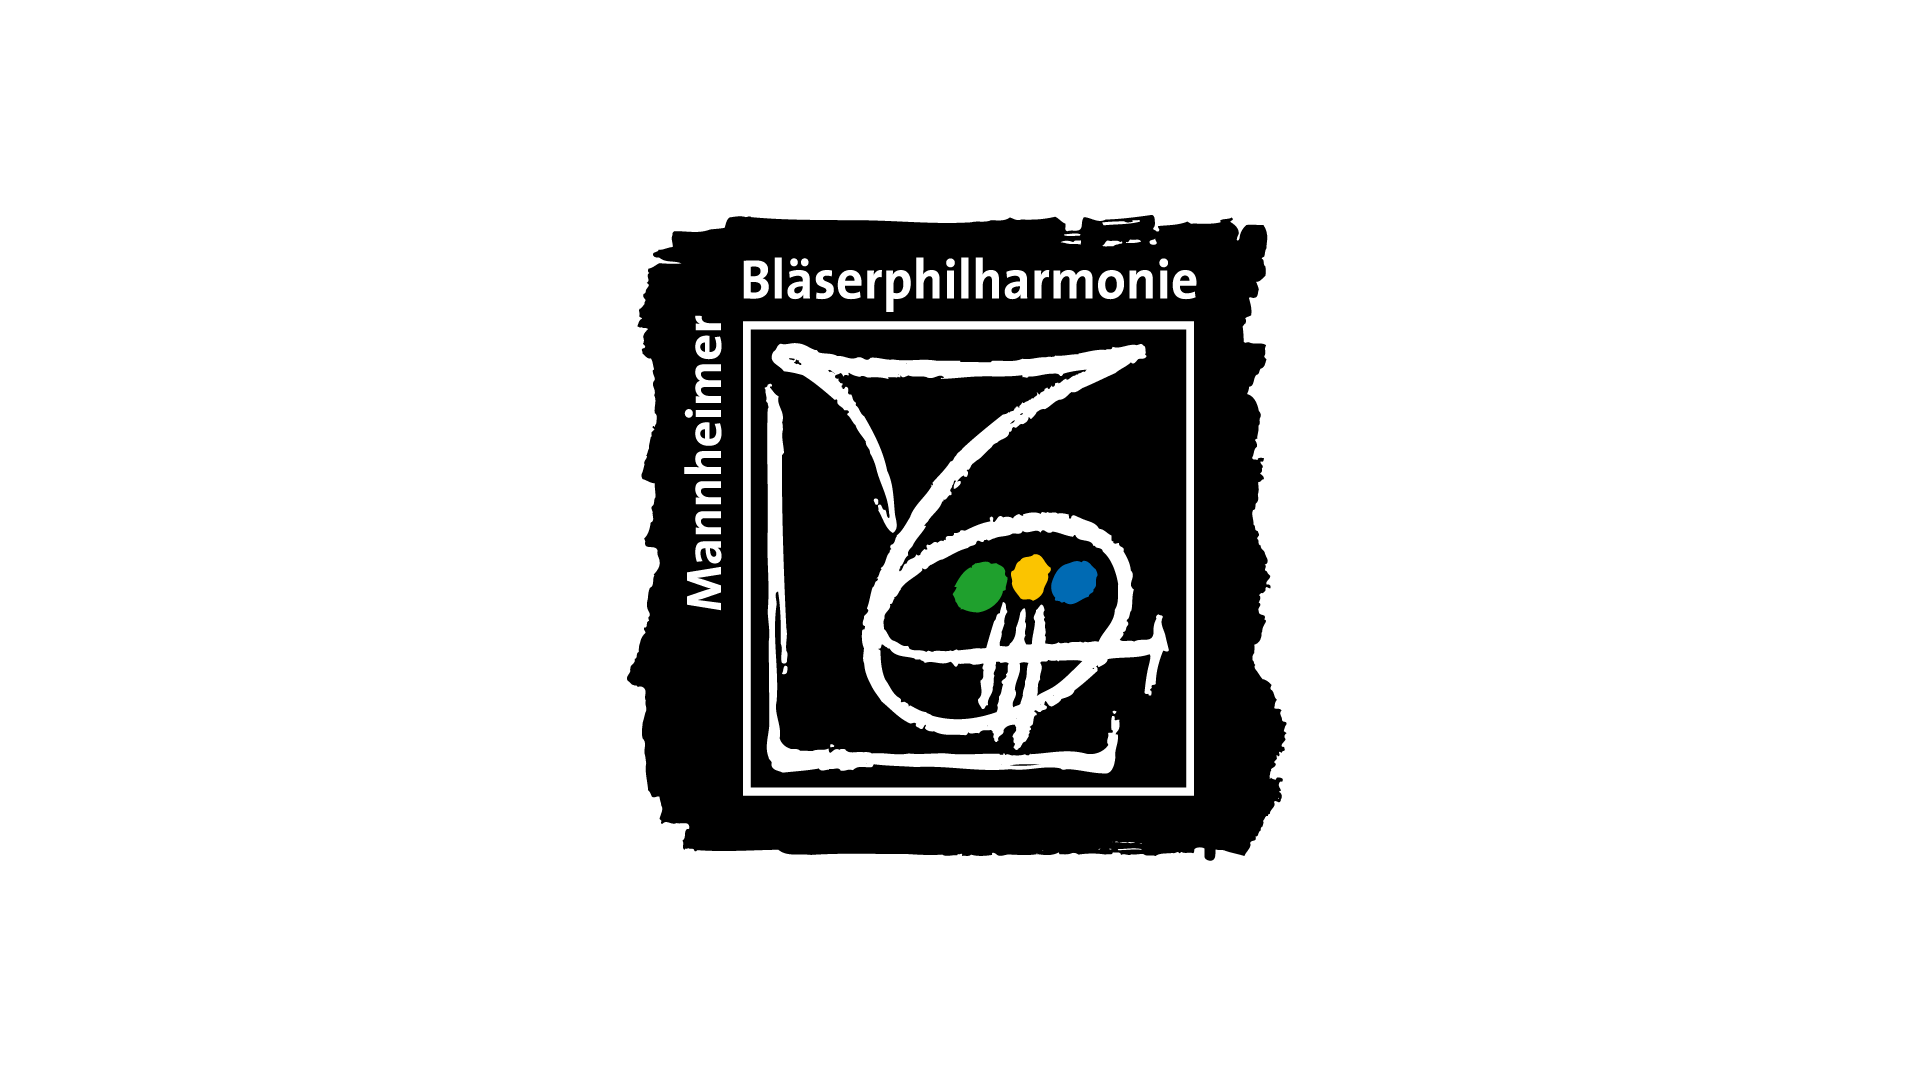 Sinfonisches Jugendblasorchester Mannheim (MBP) Logo, Corporate Design, Flyer, Plakate, Broschüren, Musik CDs